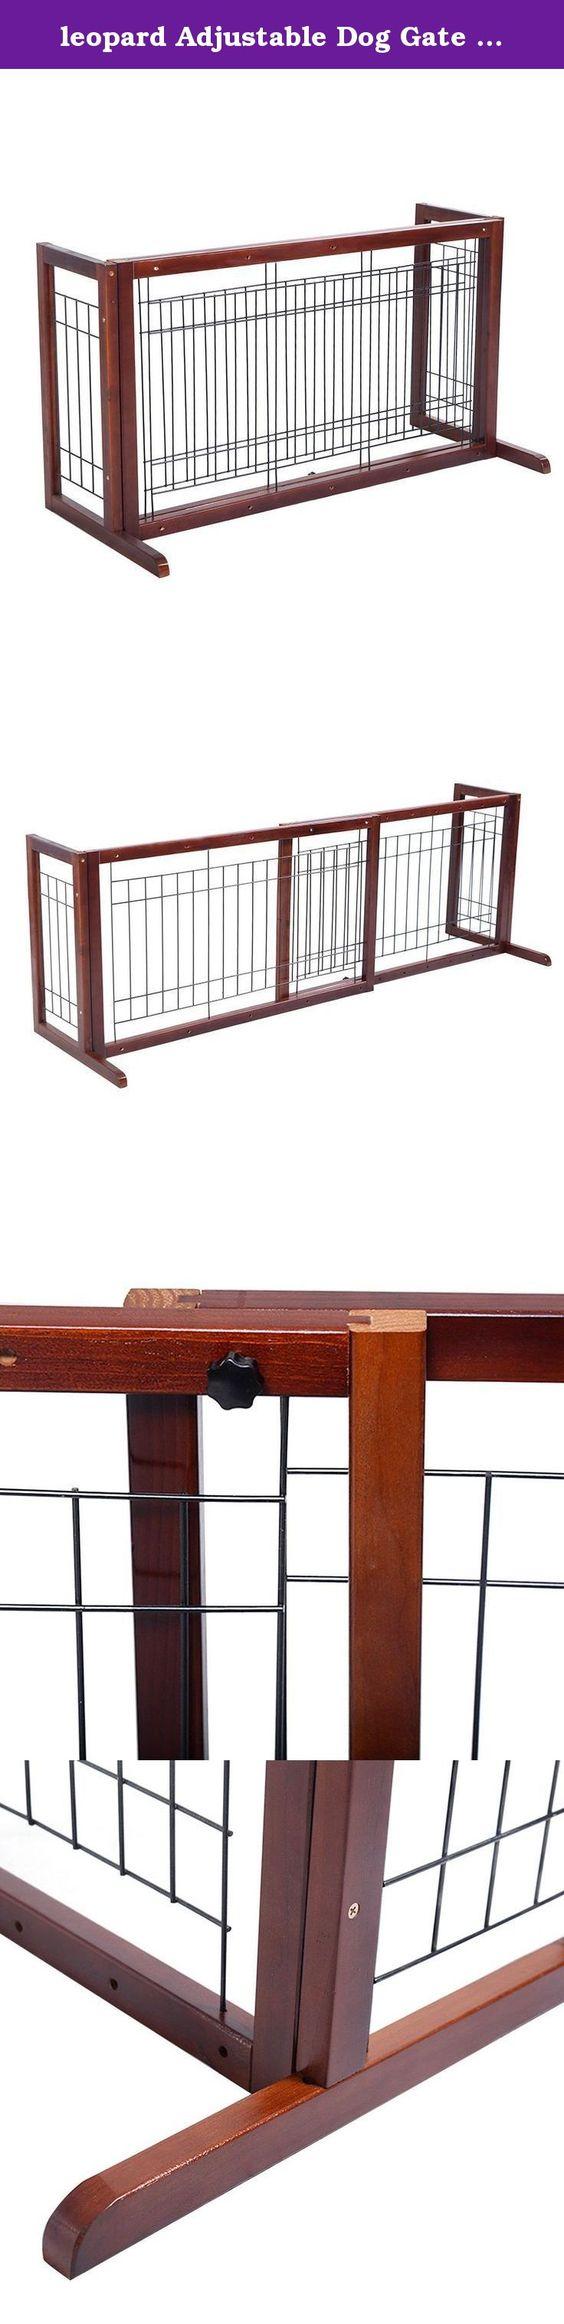 Leopard adjustable dog gate pet fence playpen indoor solid leopard adjustable dog gate pet fence playpen indoor solid construction free stand fir wood specifications baanklon Gallery